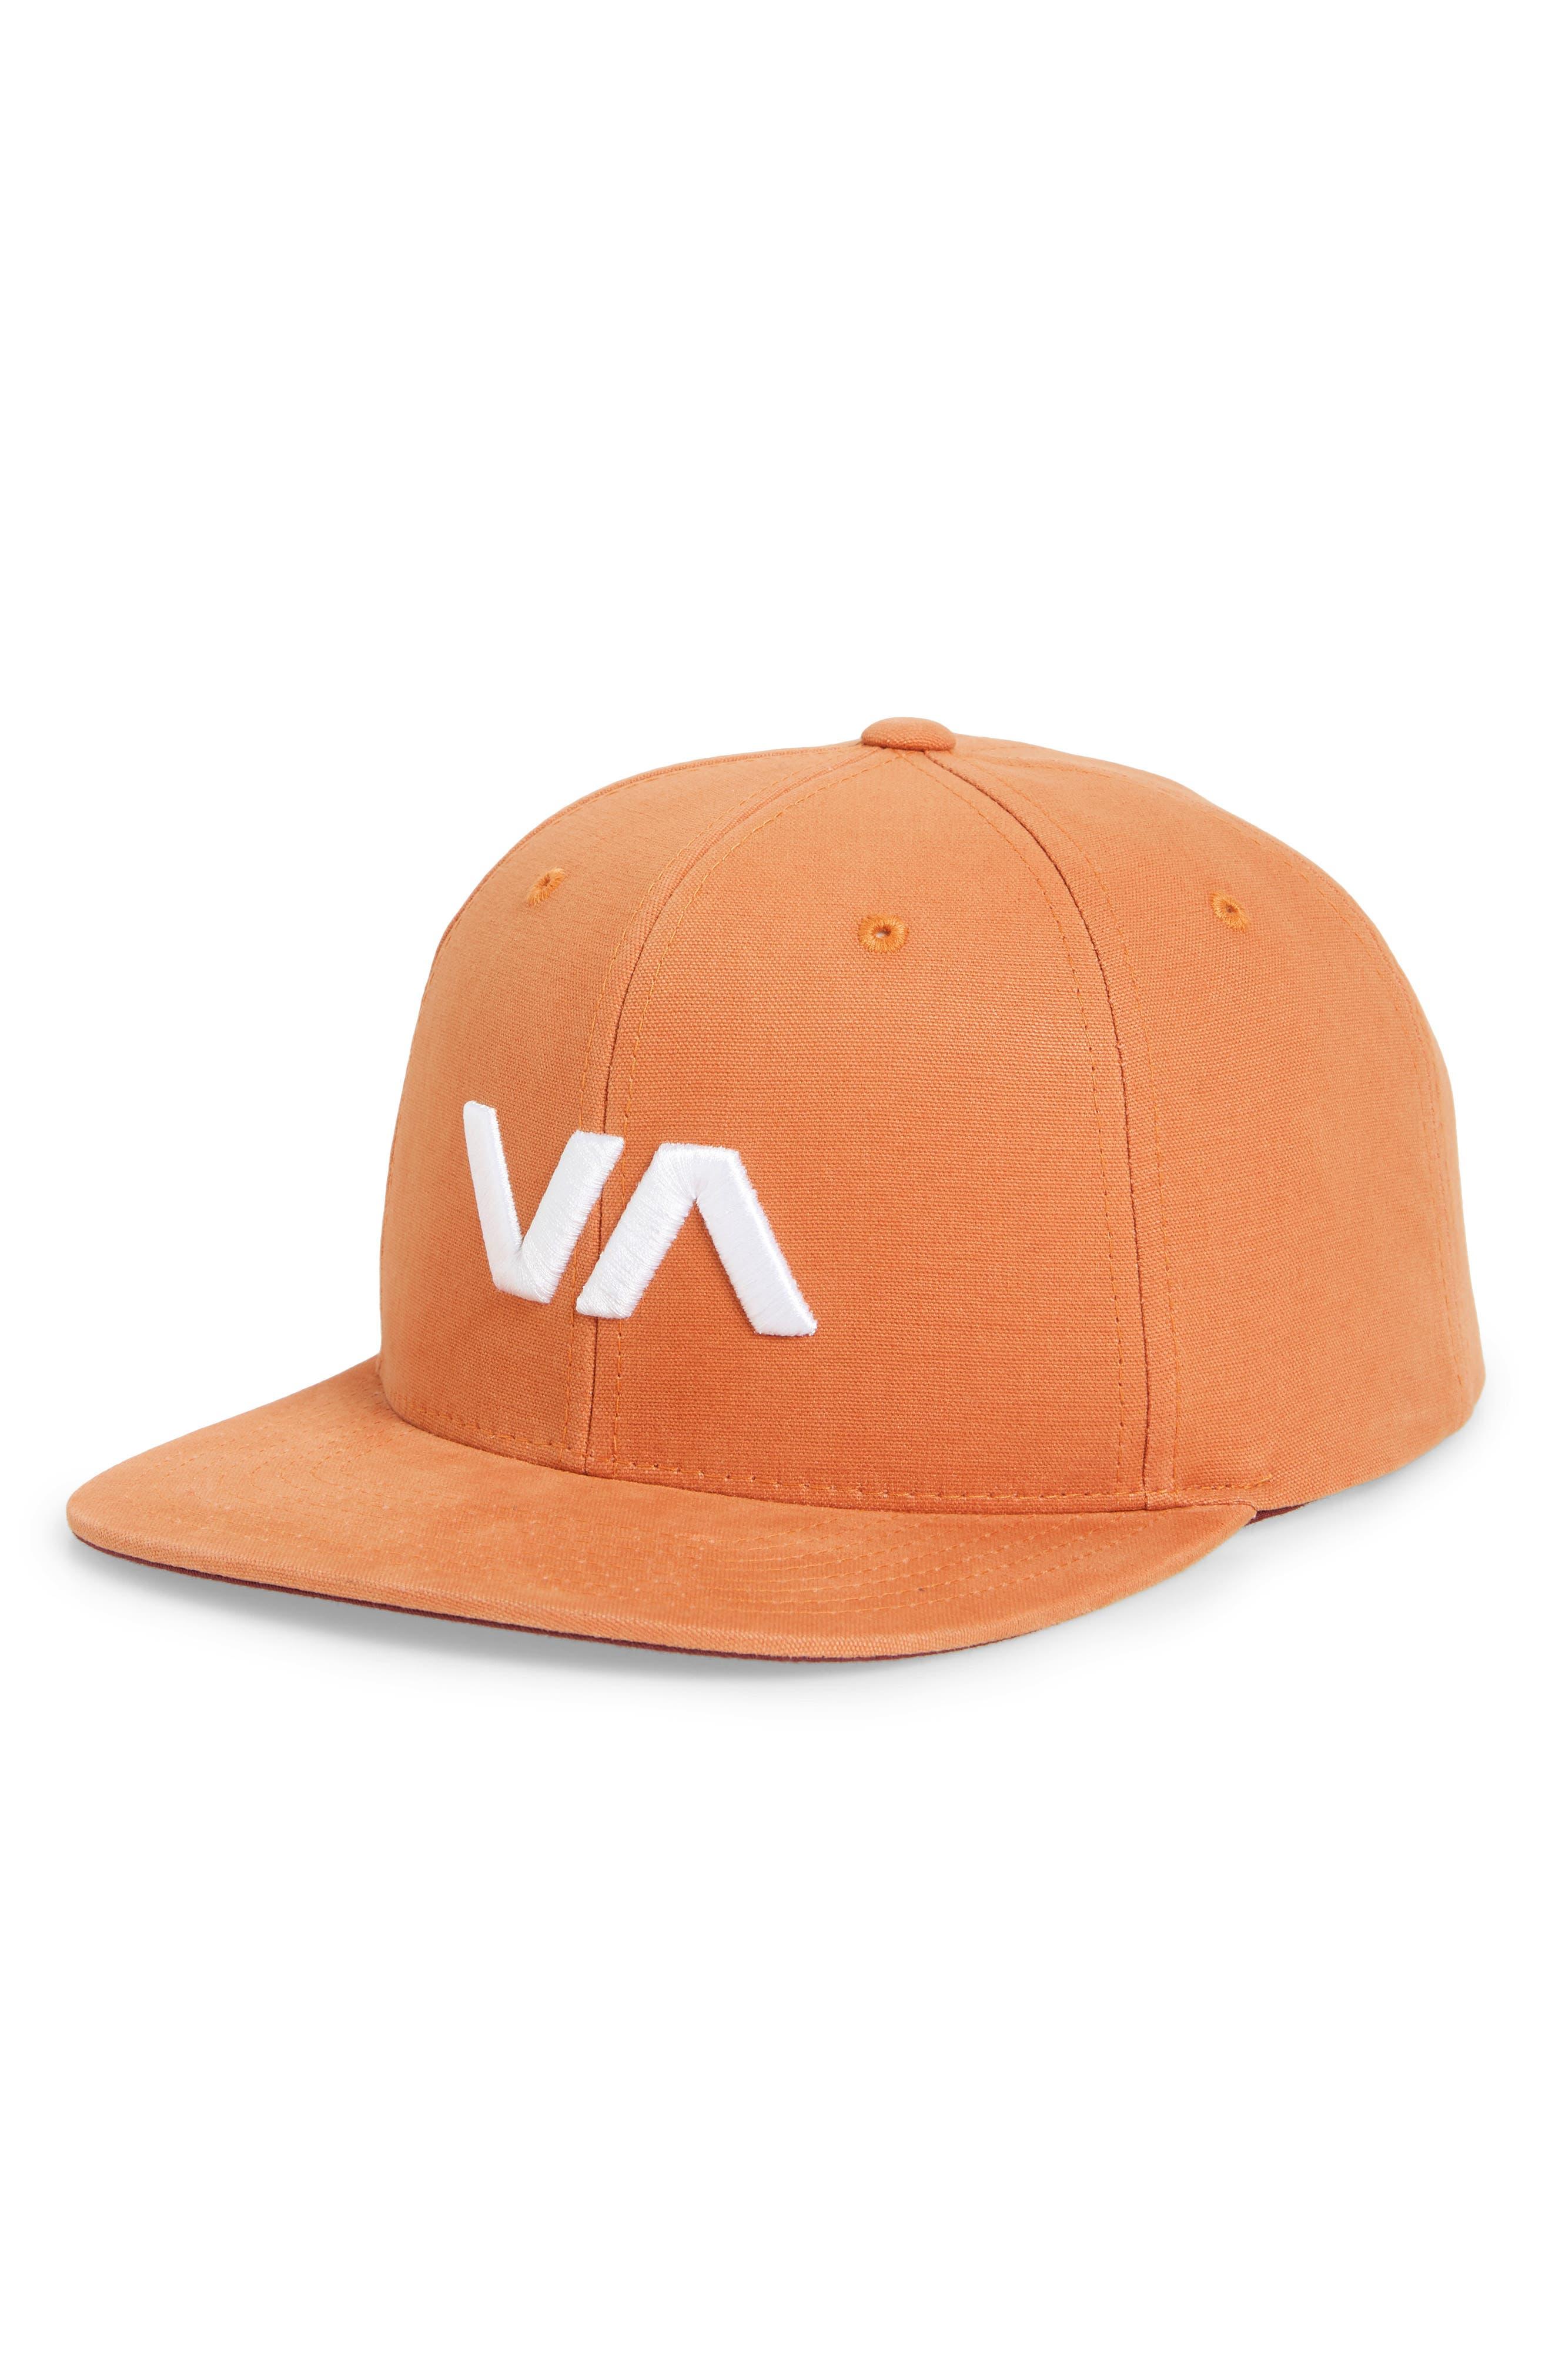 RVCA VA Snapback II Snapback Hat, Main, color, BRICK RED